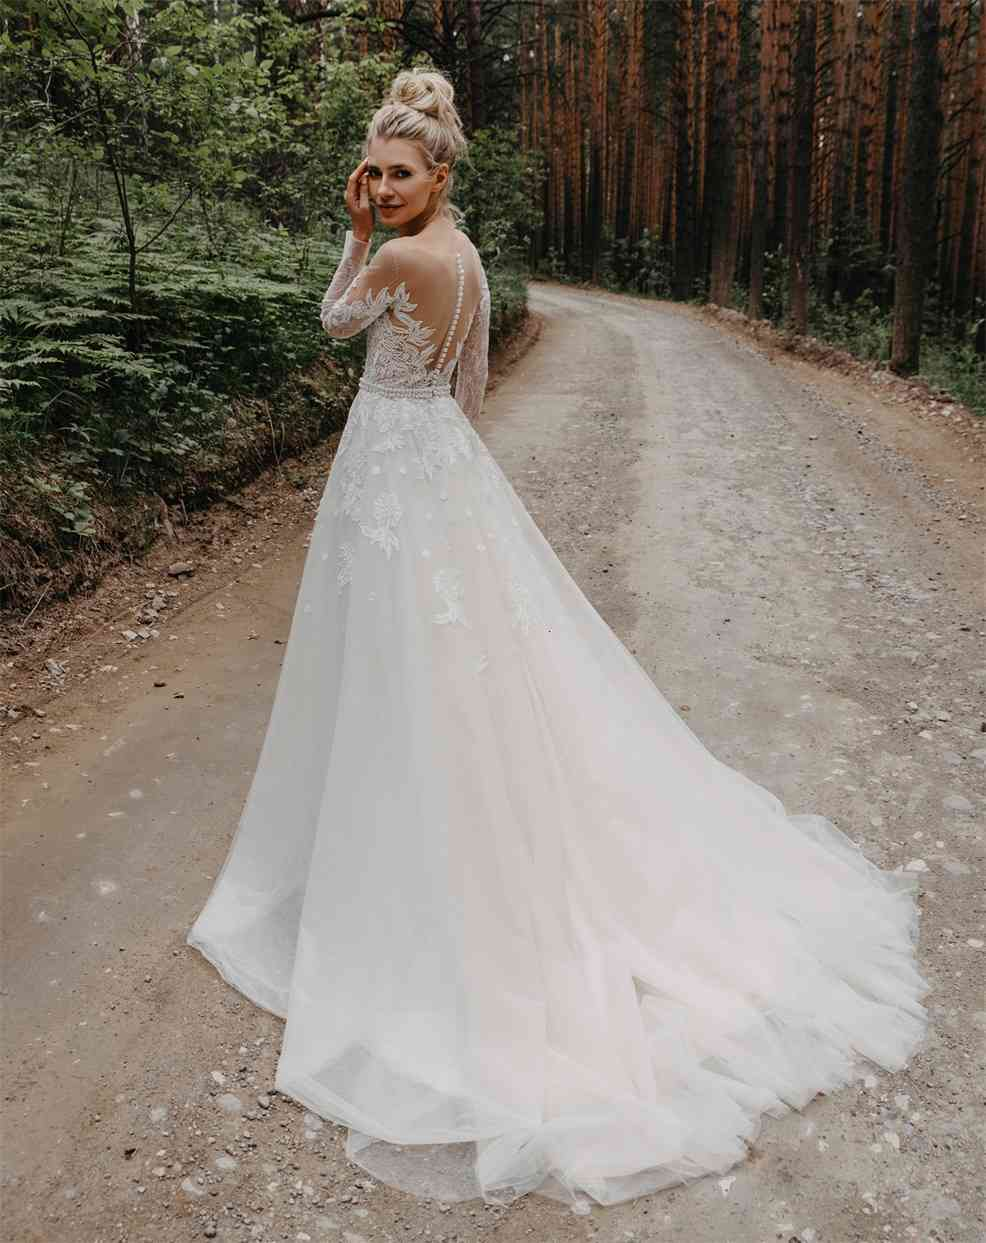 2020 Bohemian Wedding Dresses Jewel Long Sleeves Applique A Line Wedding Dress Sweep Train Bridal Gowns